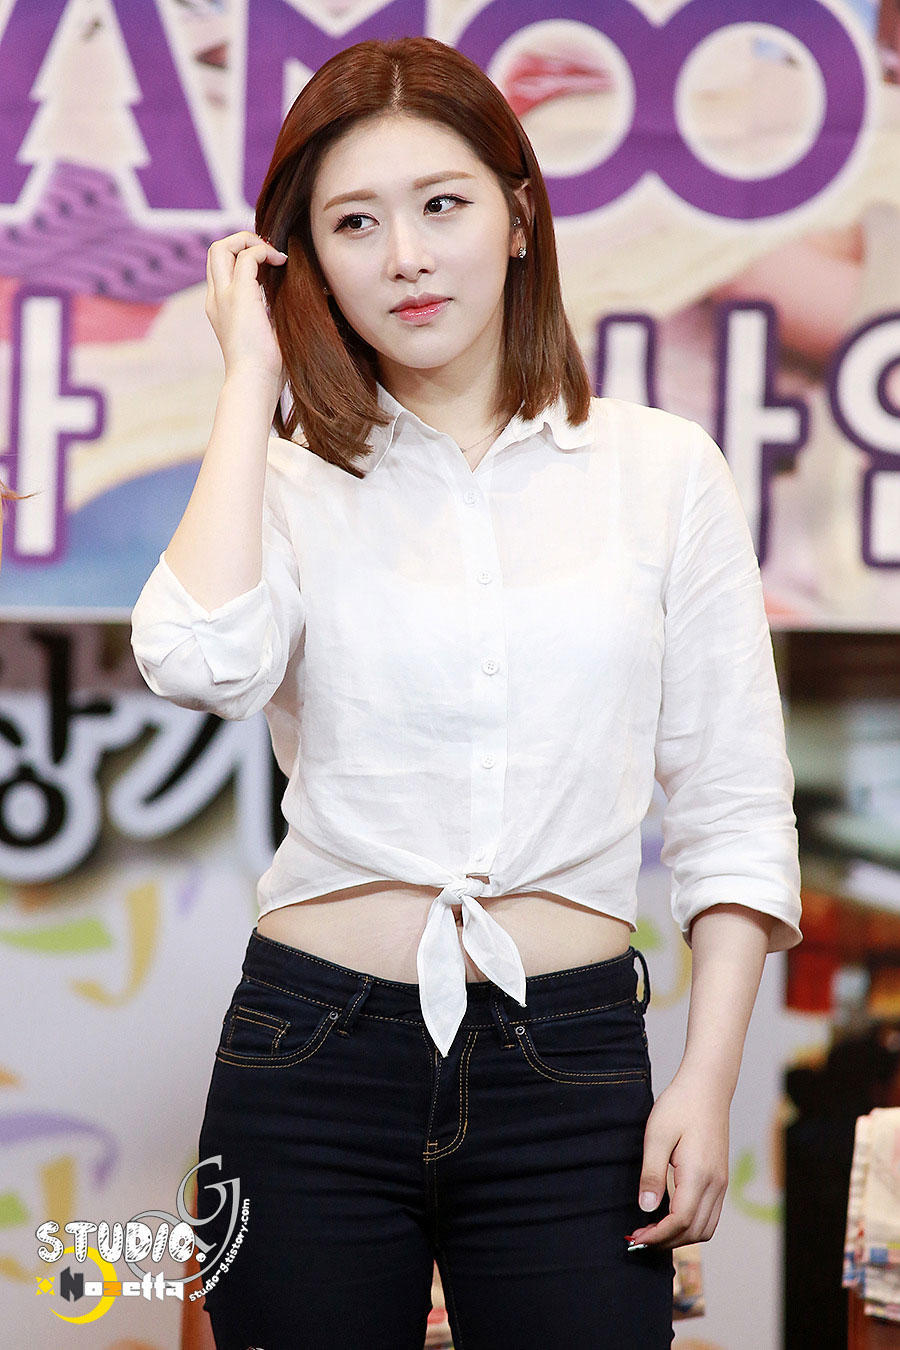 Sonamoo Eui Jin Cushion fan signing event